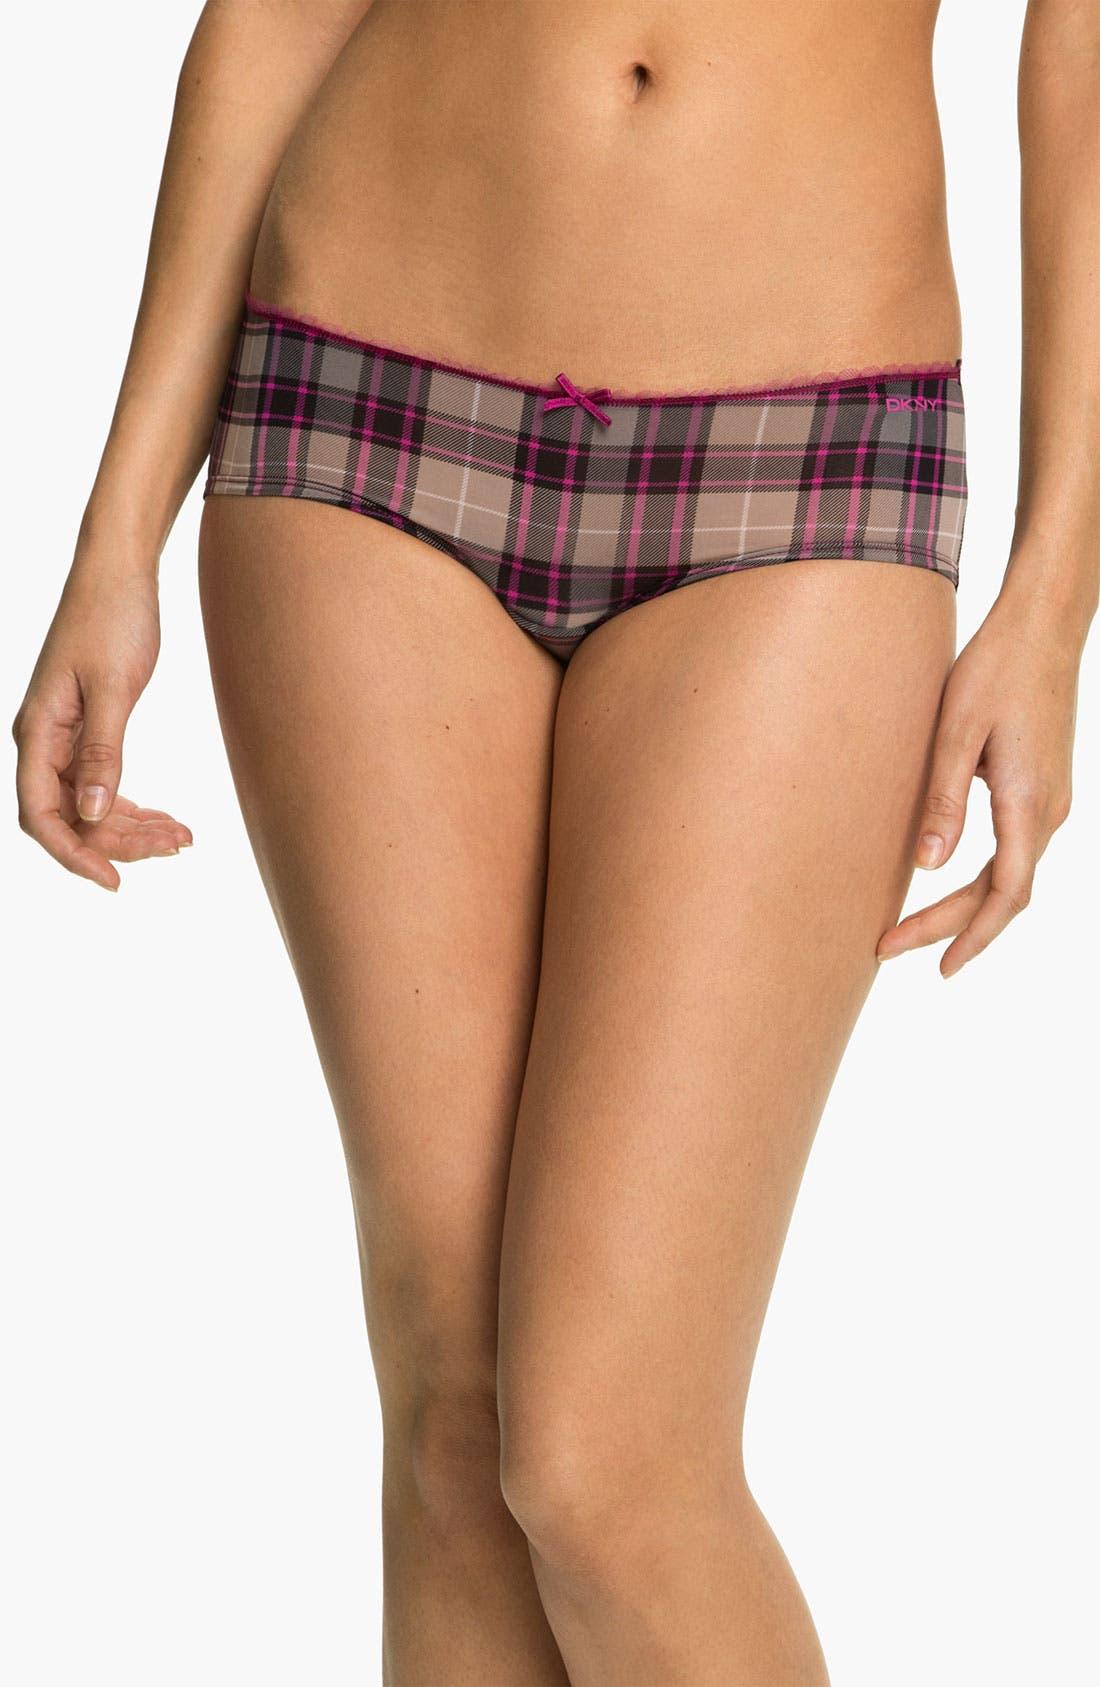 Alternate Image 1 Selected - DKNY 'Super Sleek' Girl Shorts